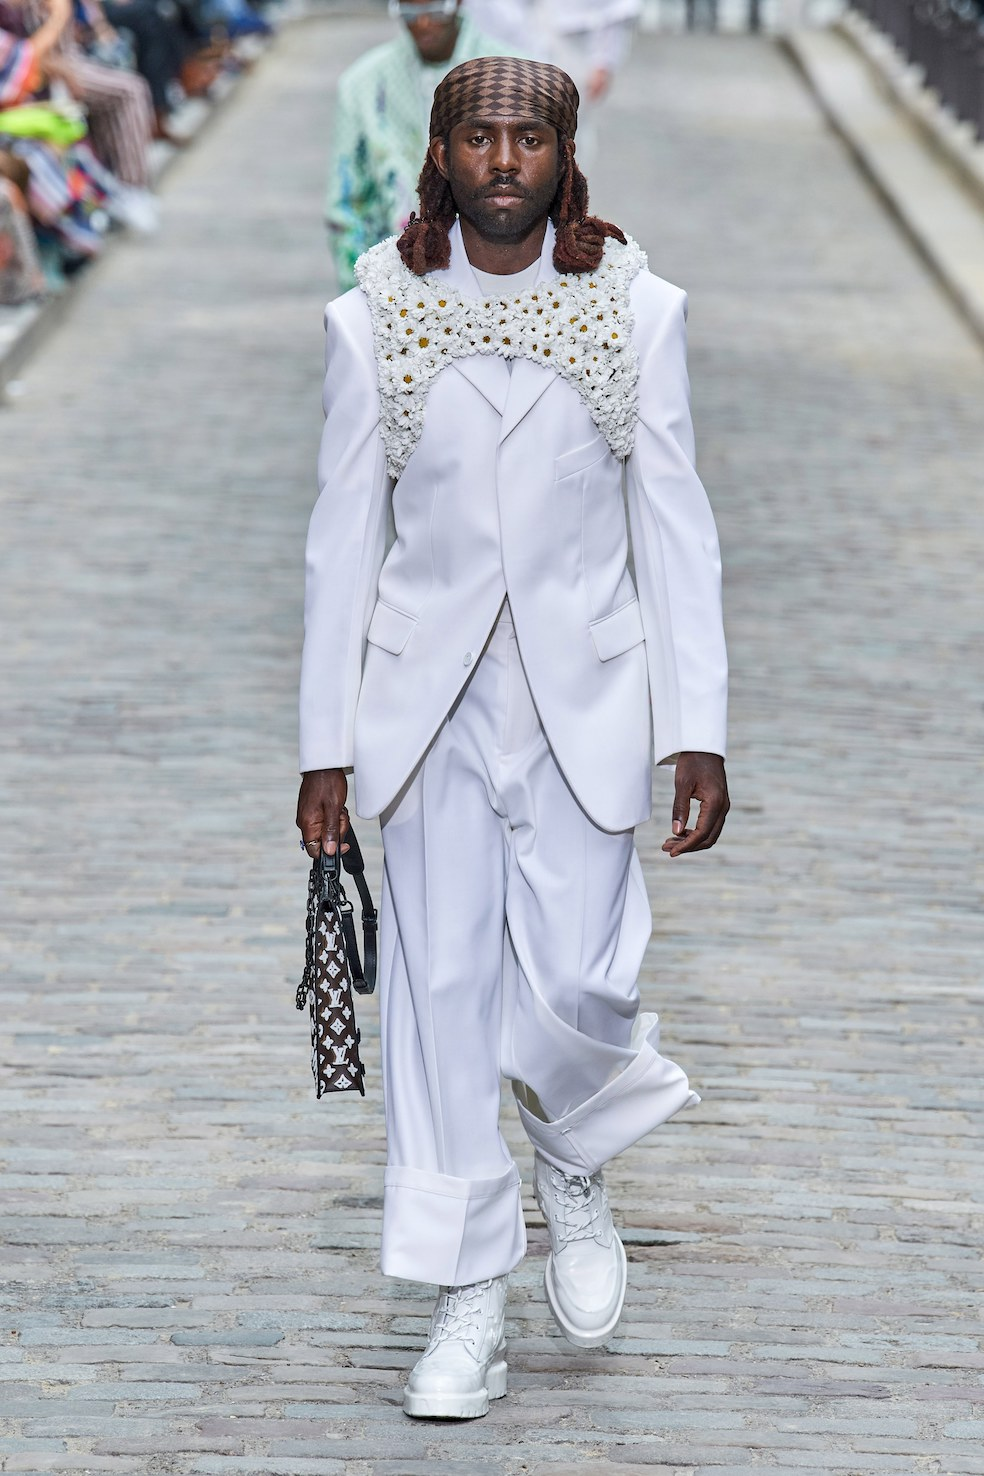 Louis_Vuitton_SS20_Behind_The_Blinds_Magazine__FIO0805.jpg